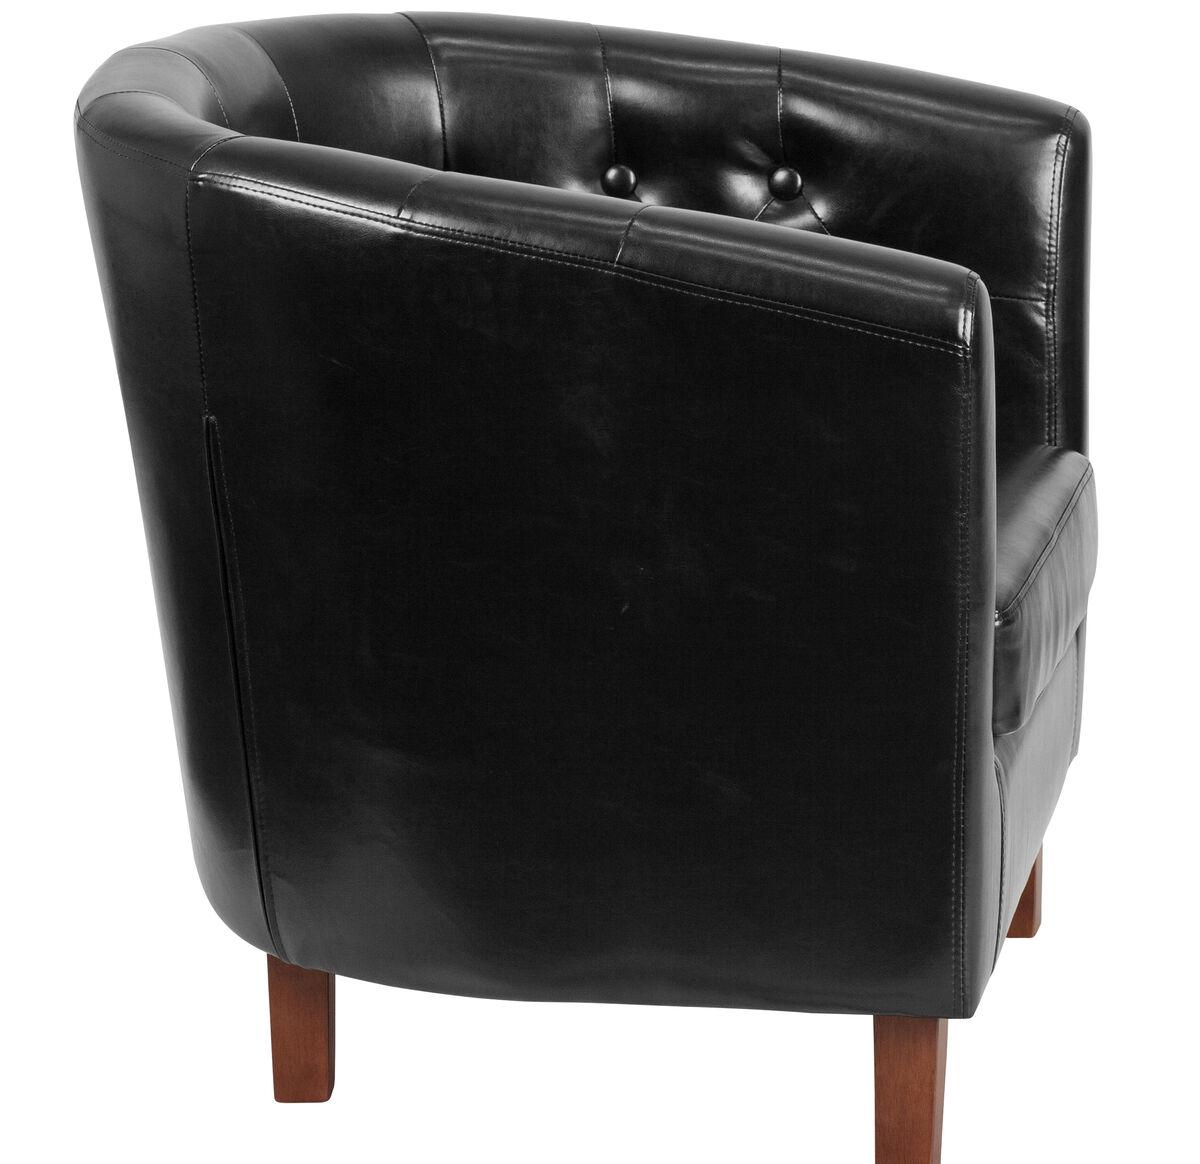 black leather barrel chair qy b16 hy 9030 4 bk gg